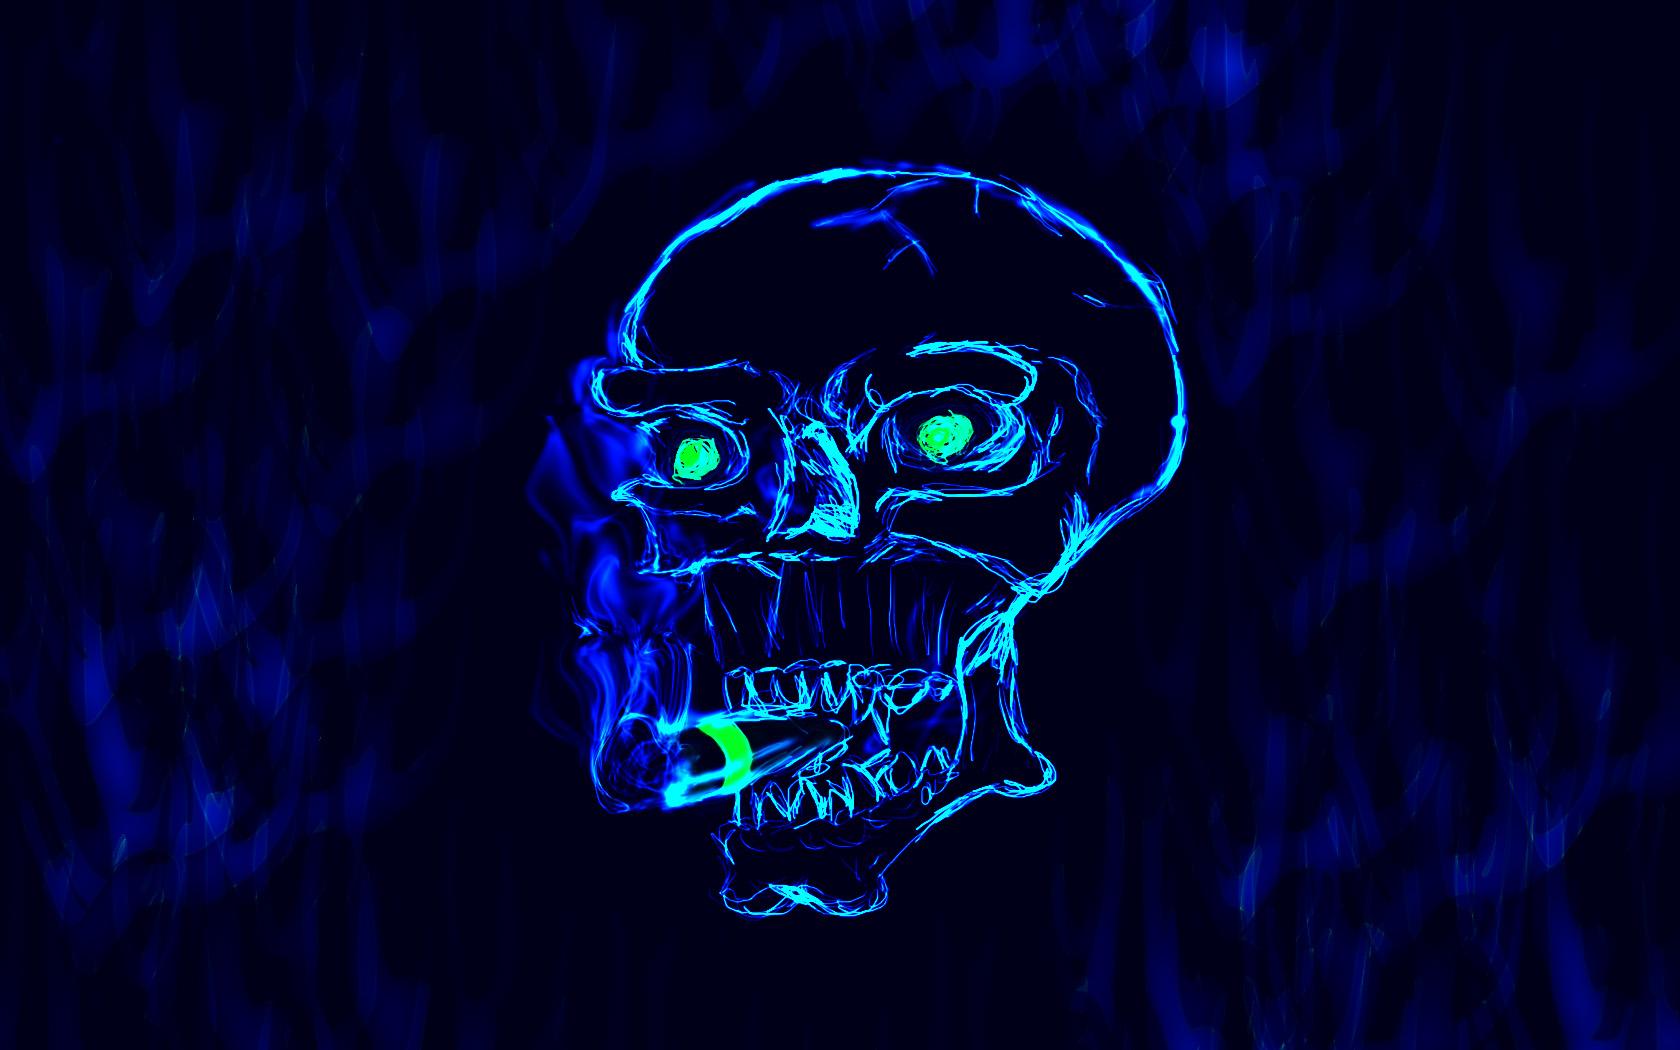 снимок картинки череп на синем фоне романец